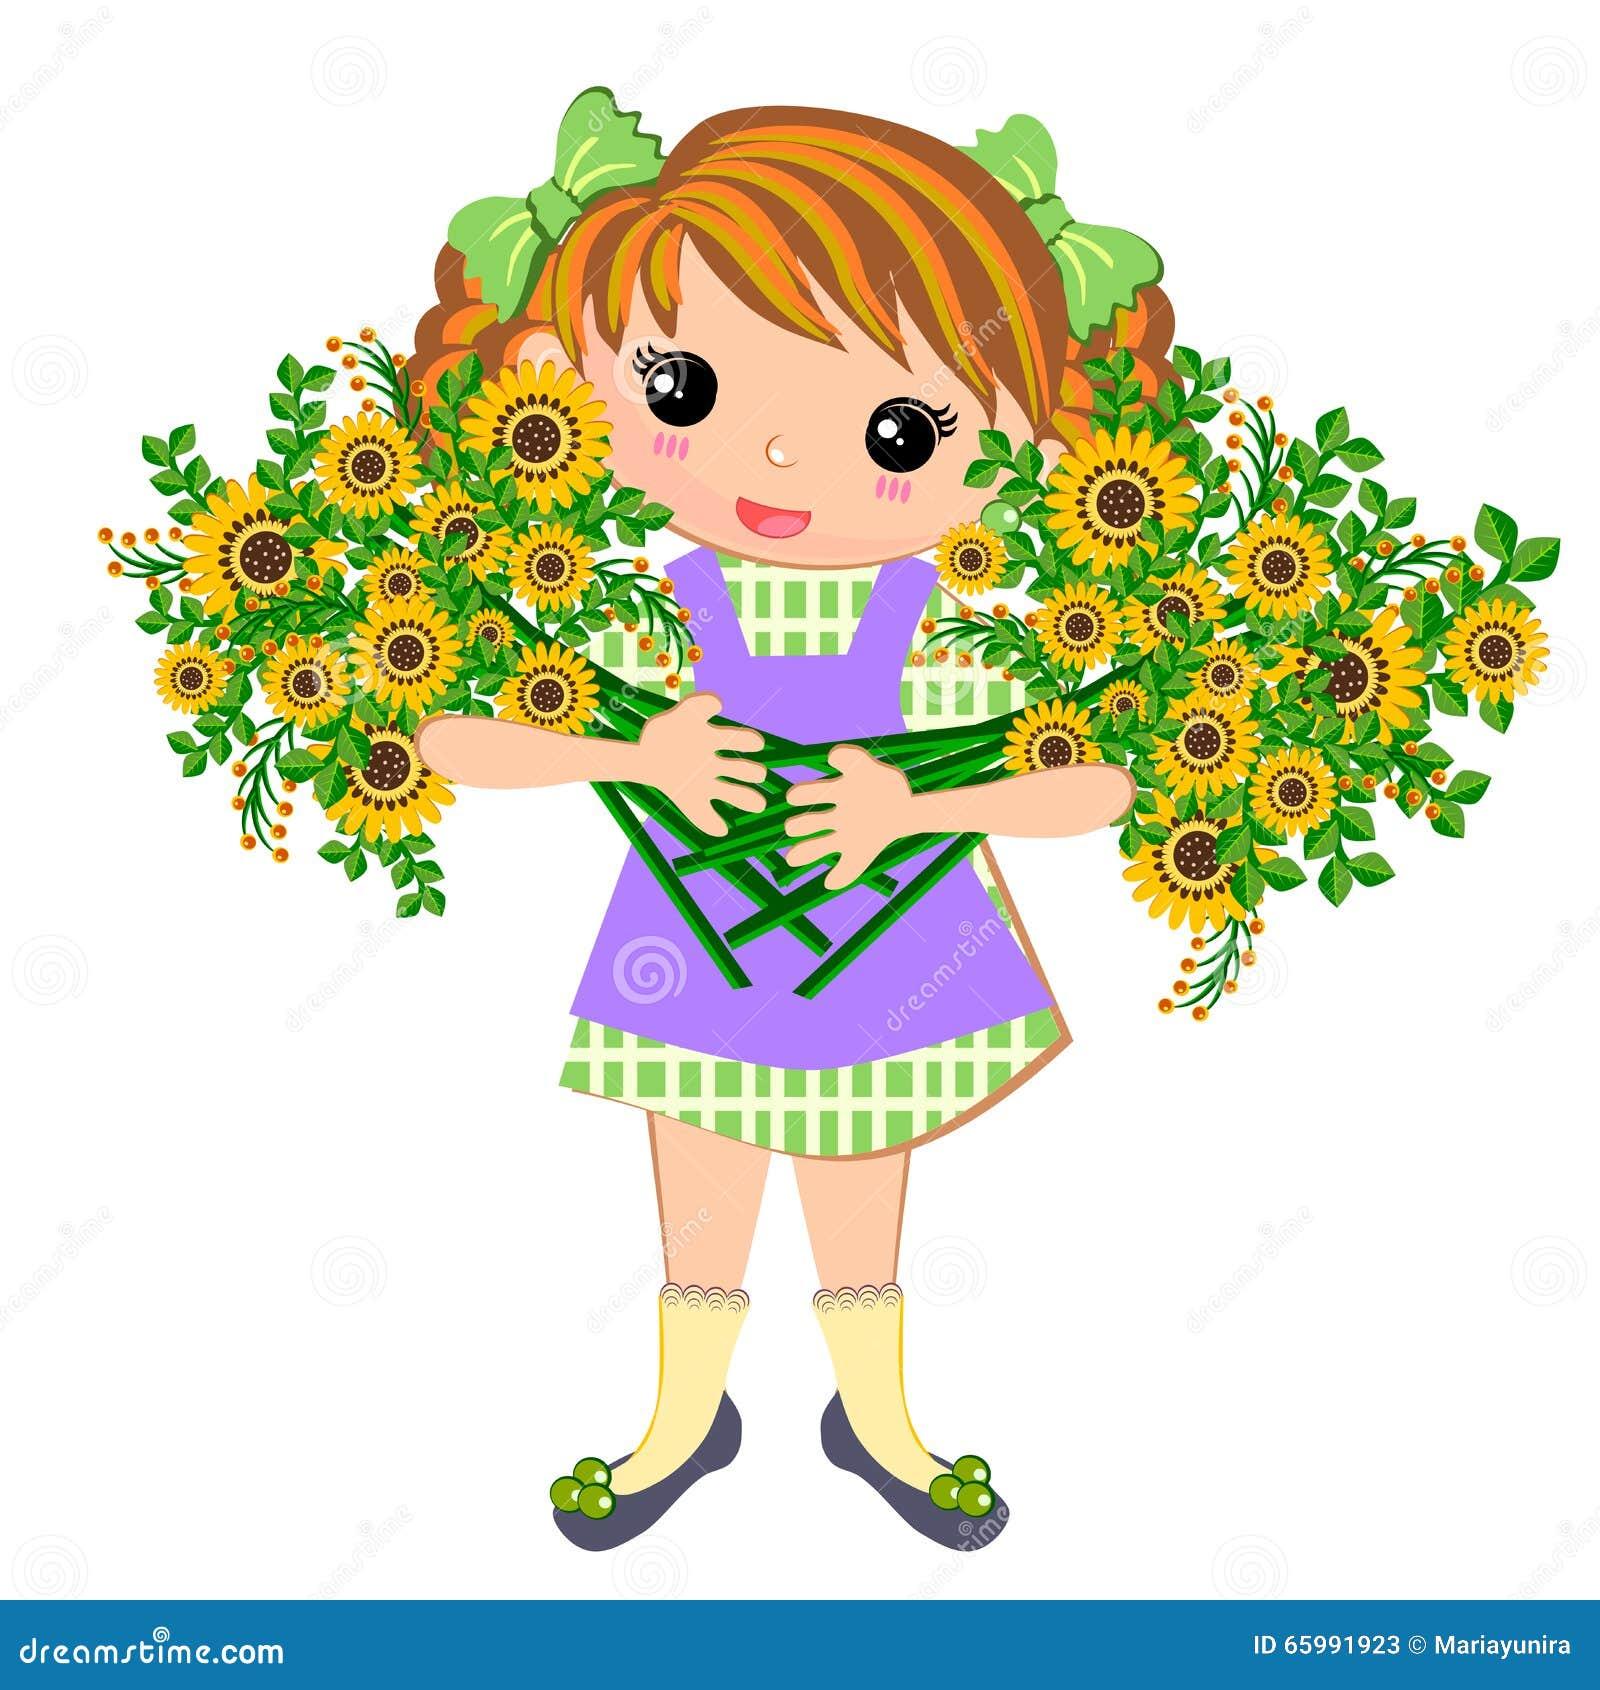 Cute Kids Girl And Bouquet Of Flowers Cartoon Vector